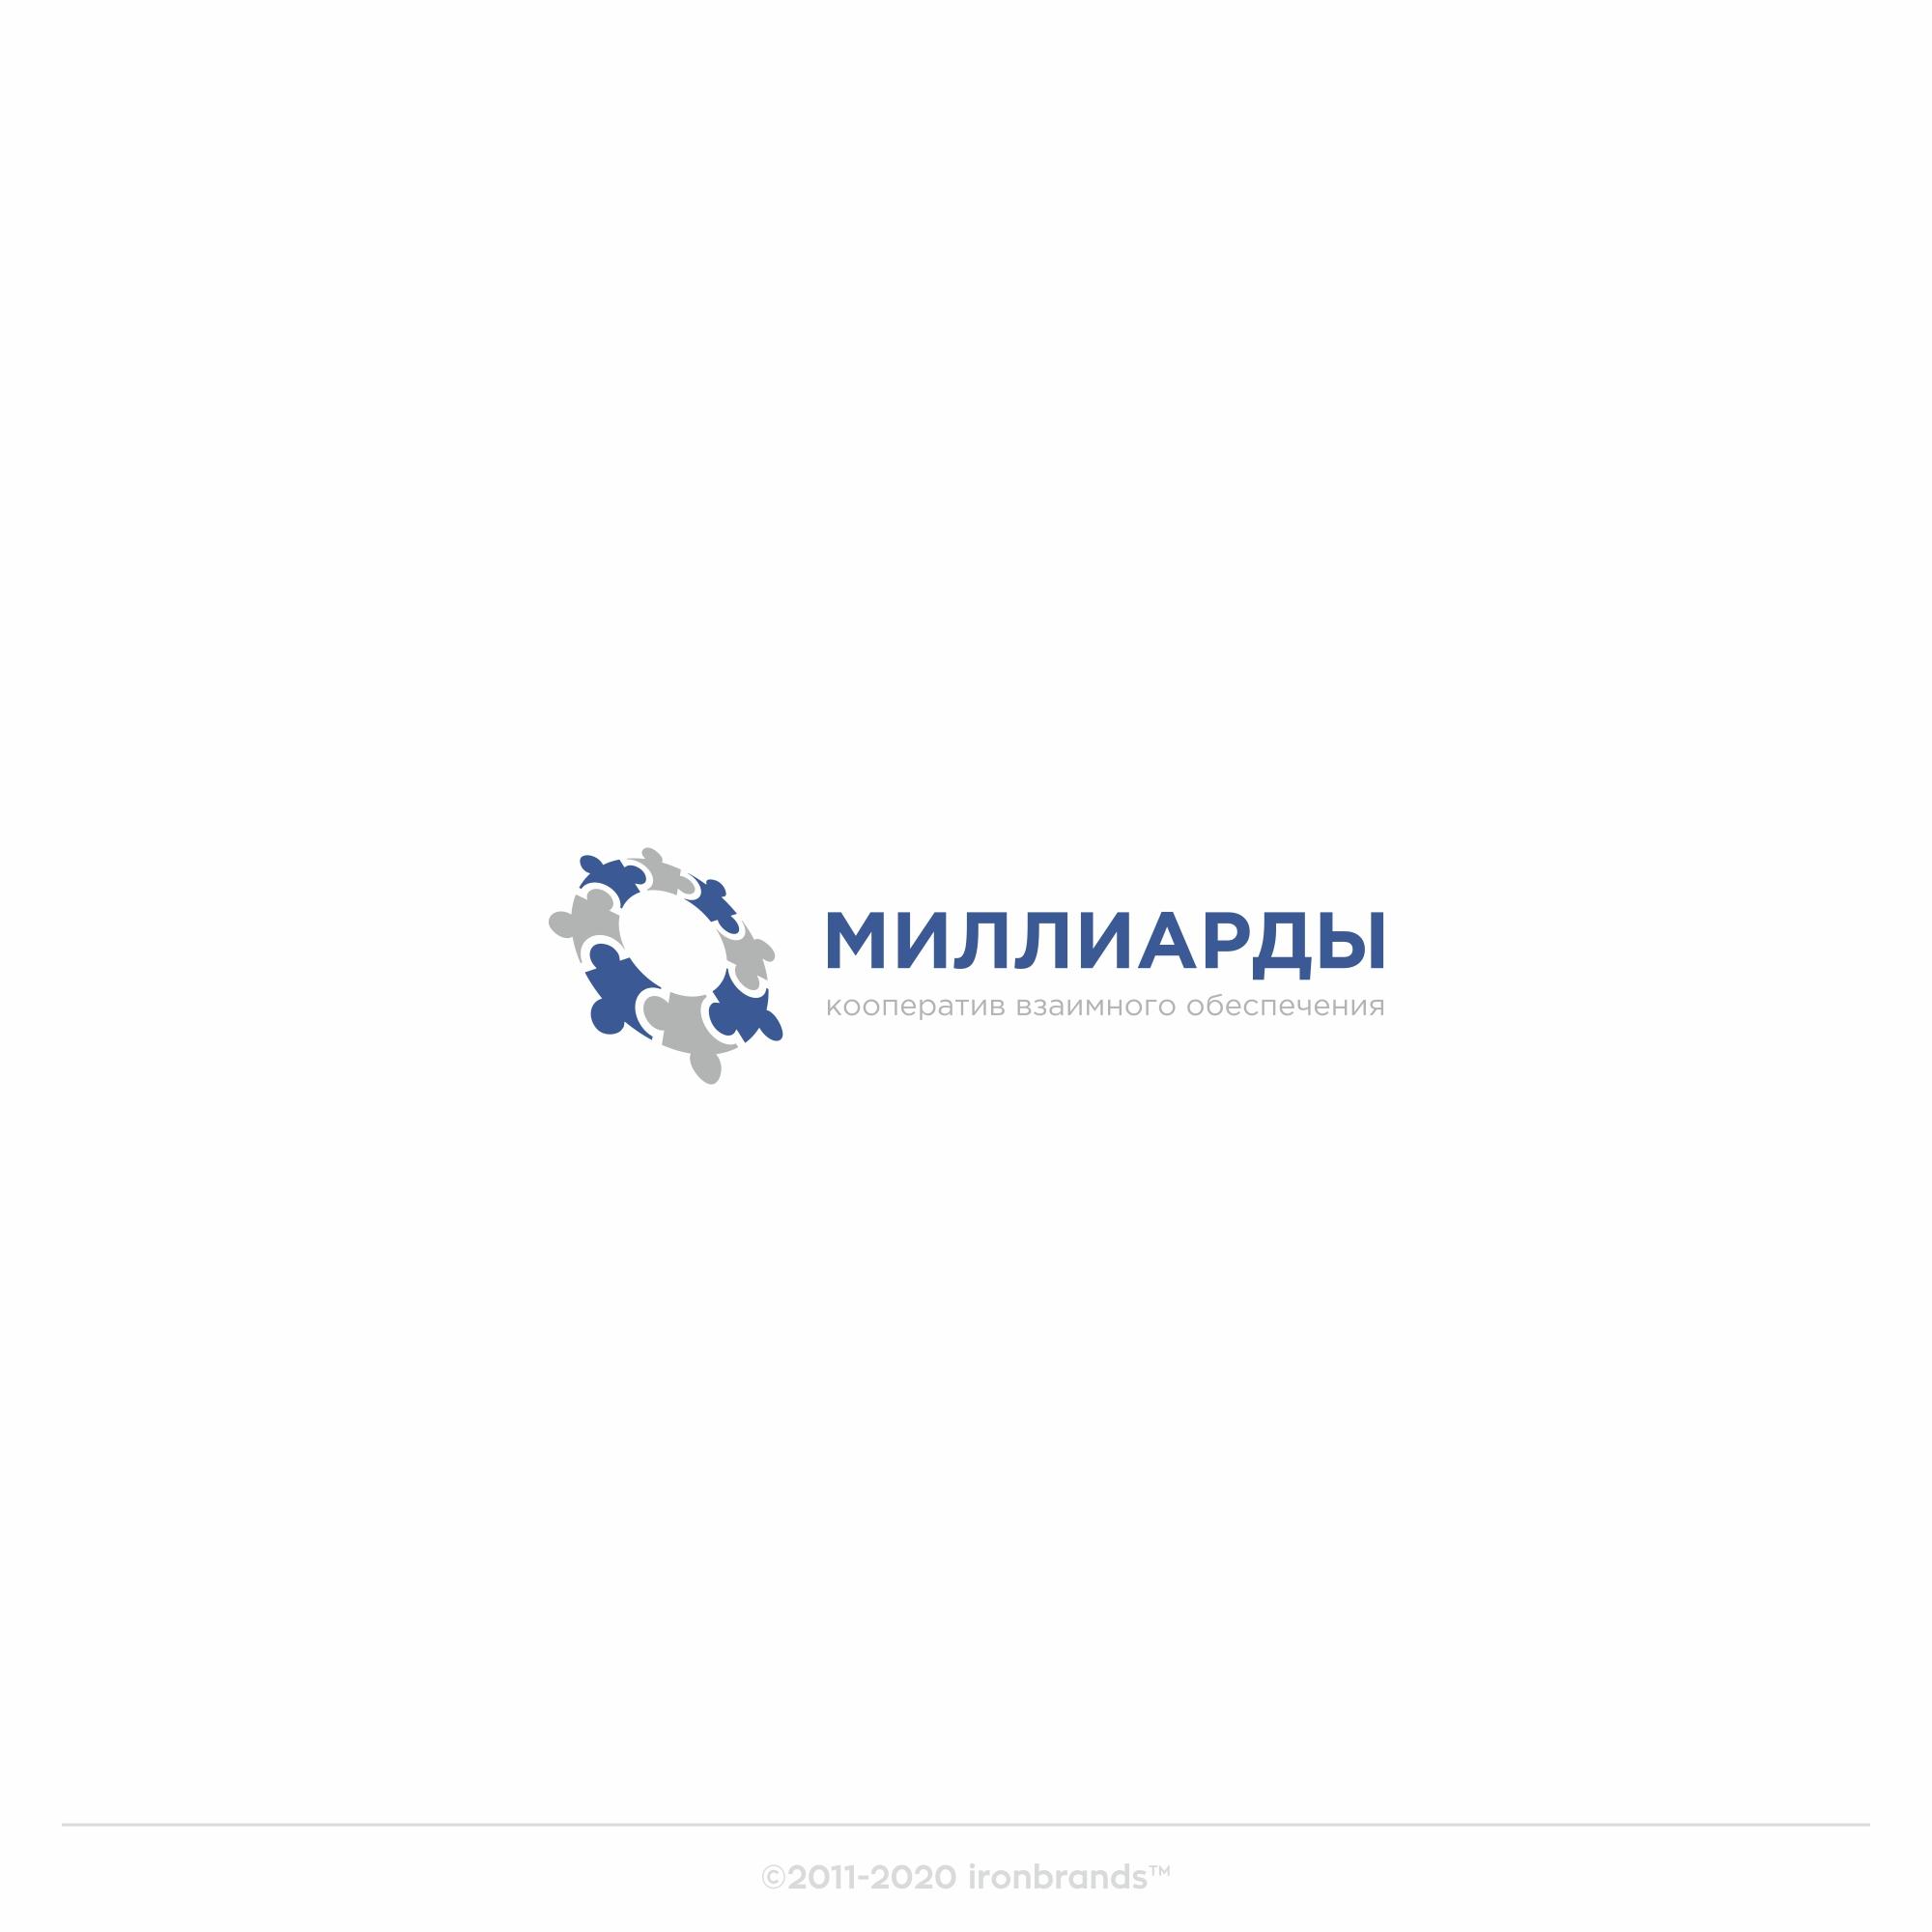 Создание логотипа фото f_2415e4129633cbe6.jpg